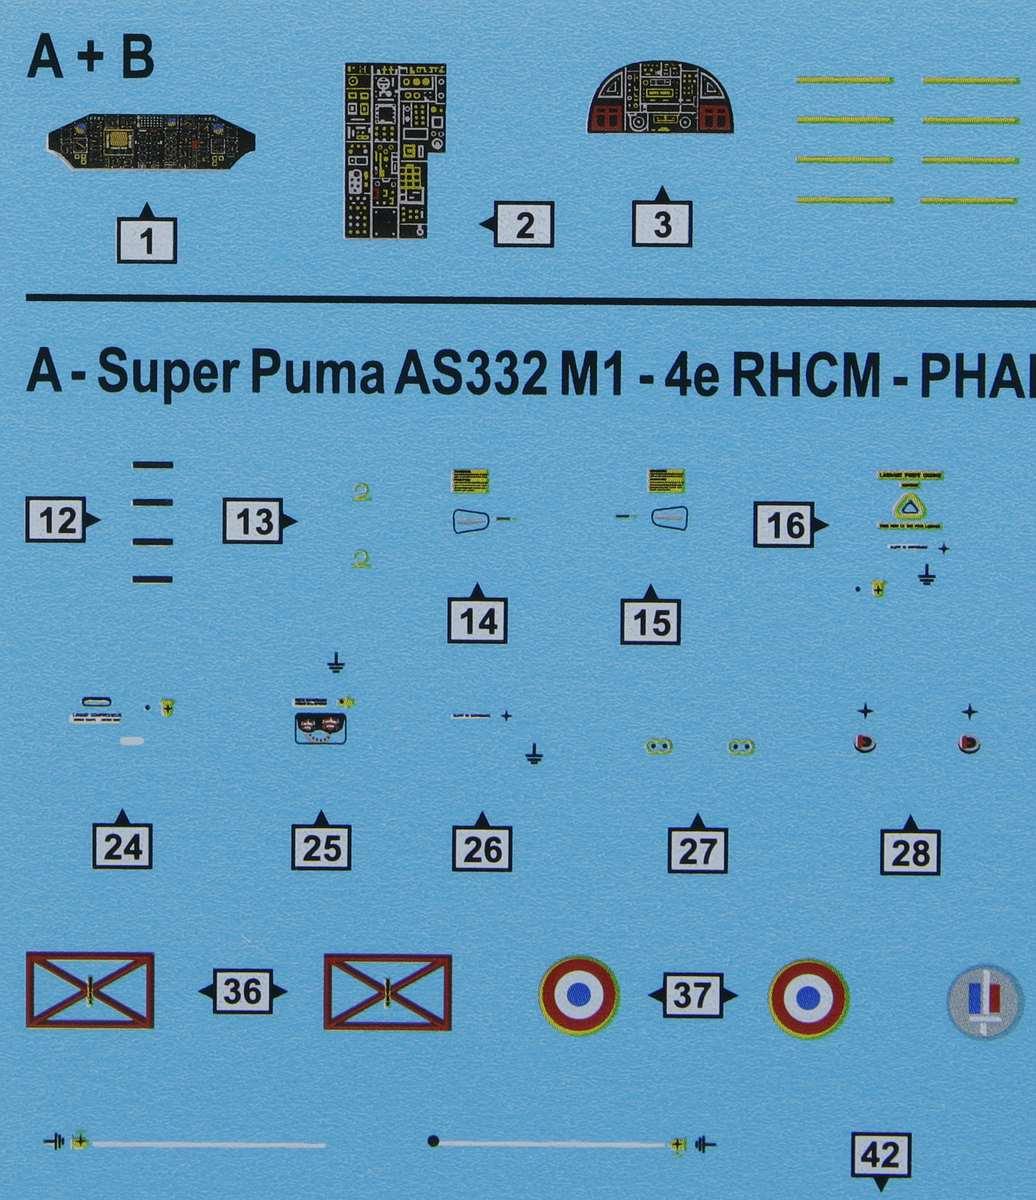 Heller-80367-AS-332-M1-Super-Puma-25 Aérospatiale AS 332 Super Puma in 1:72 von Heller # 80367